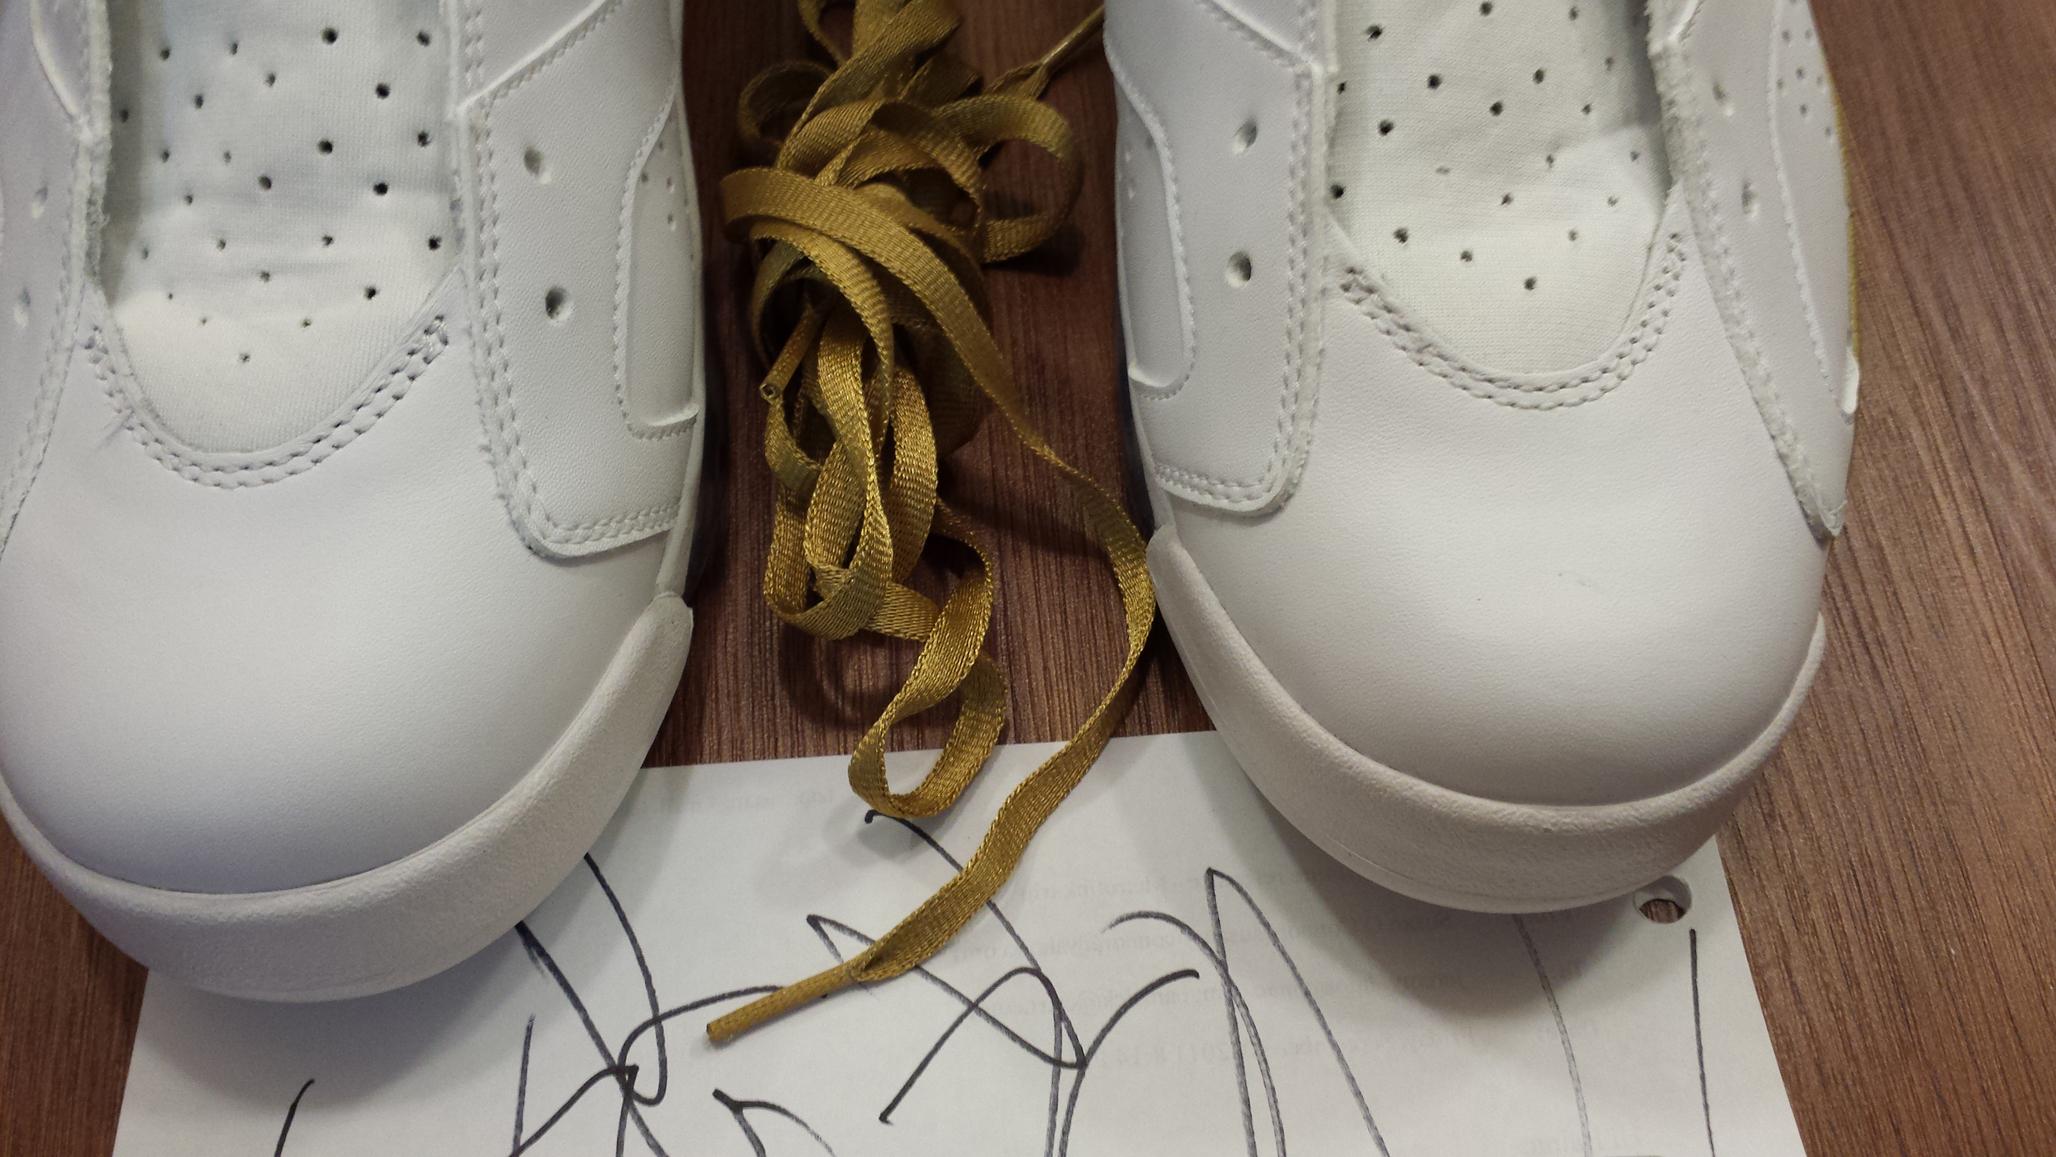 adf7c92d3d3 ... Nike Air Jordan VI from GMP Pack (size 11) - Thumbnail 2 ...